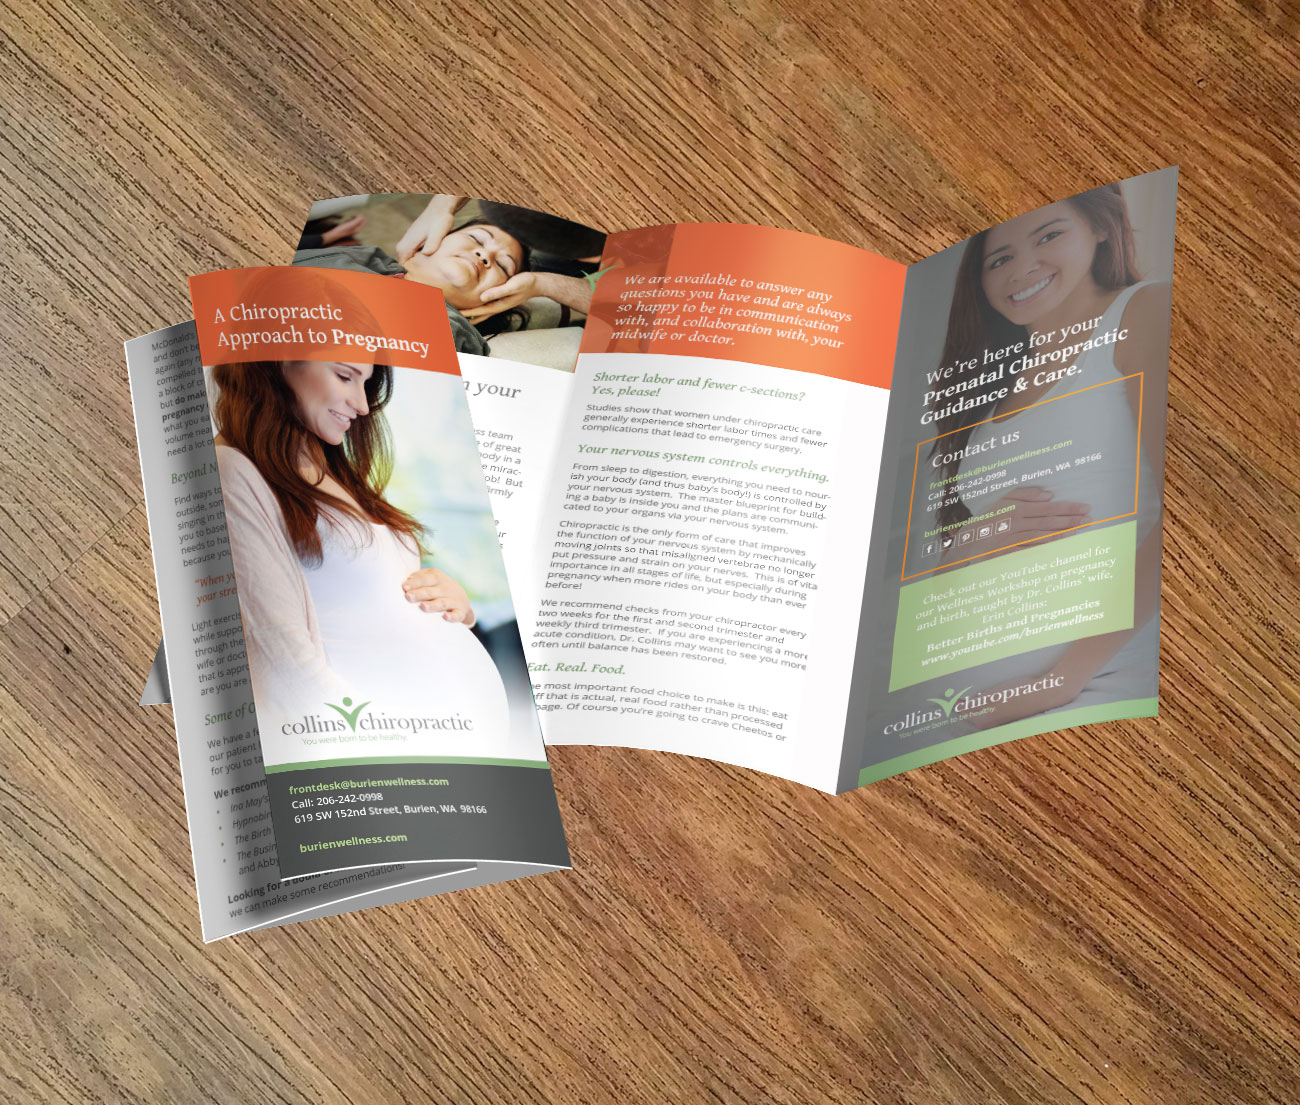 Burien Wellness Brochure designed by Fingerprint Marketing